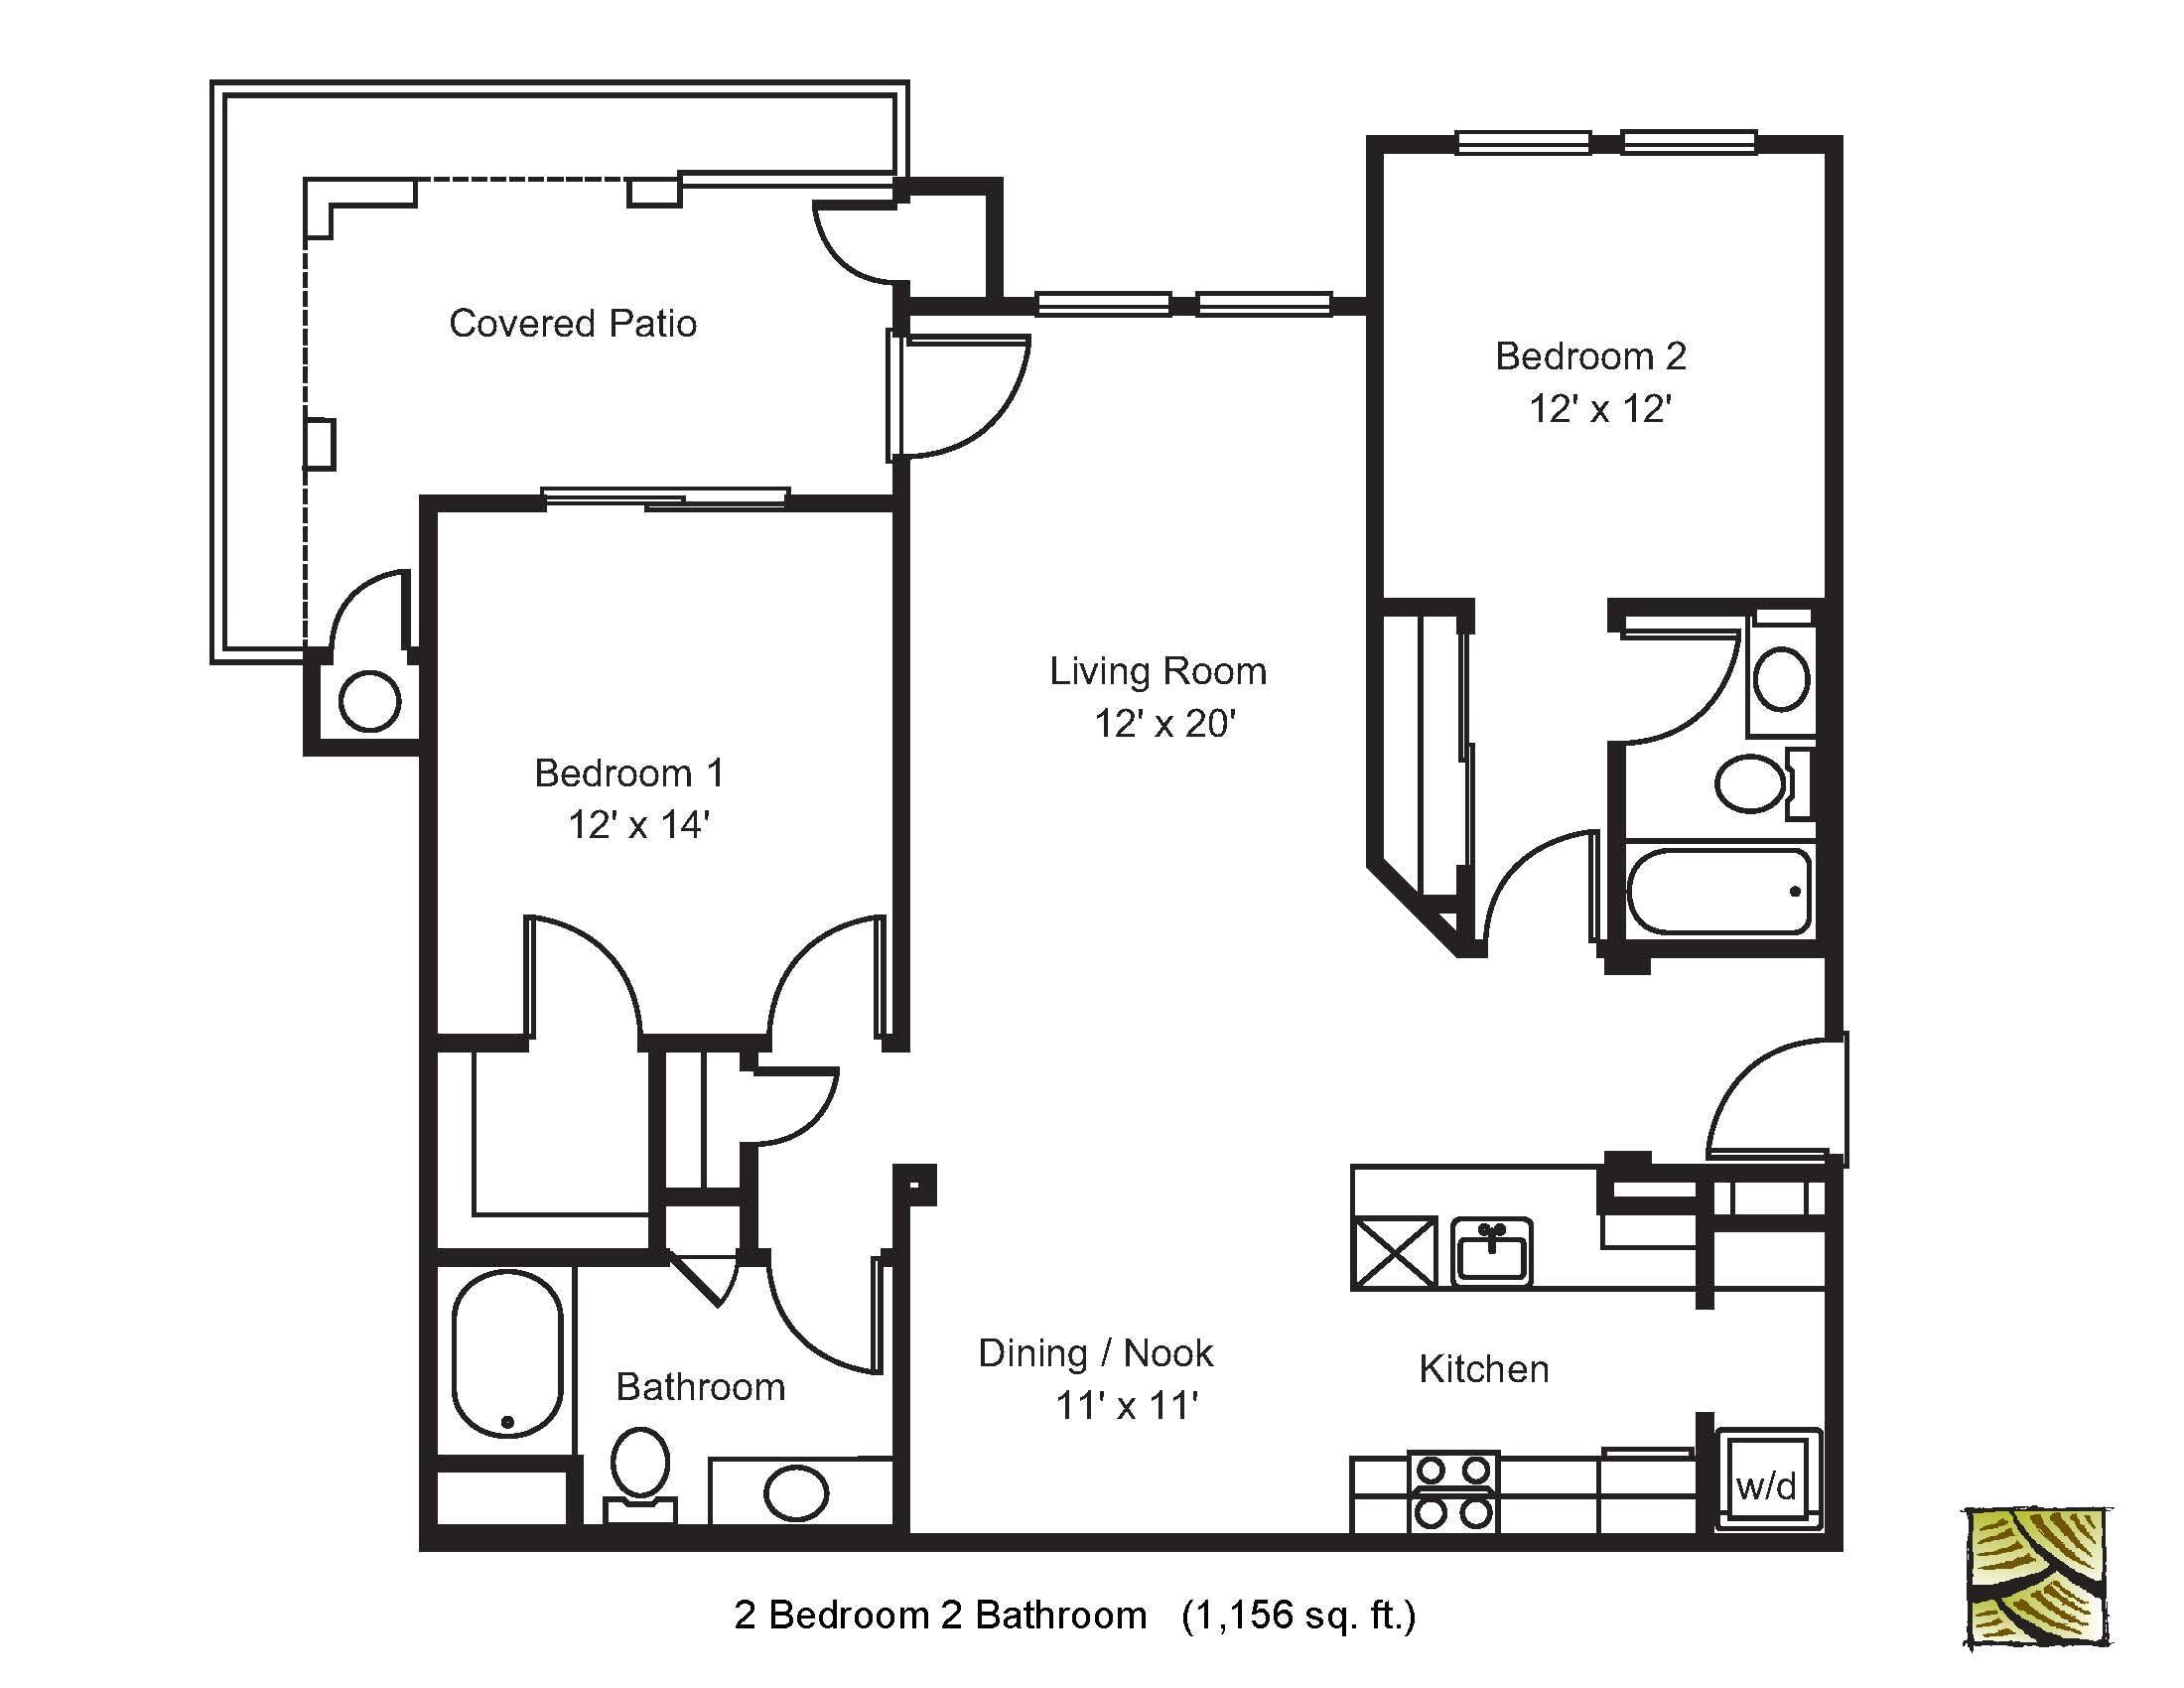 online floor plan maker of tritmonk pictures of home interior flooring design idea freeware layout floorplans simple photos search